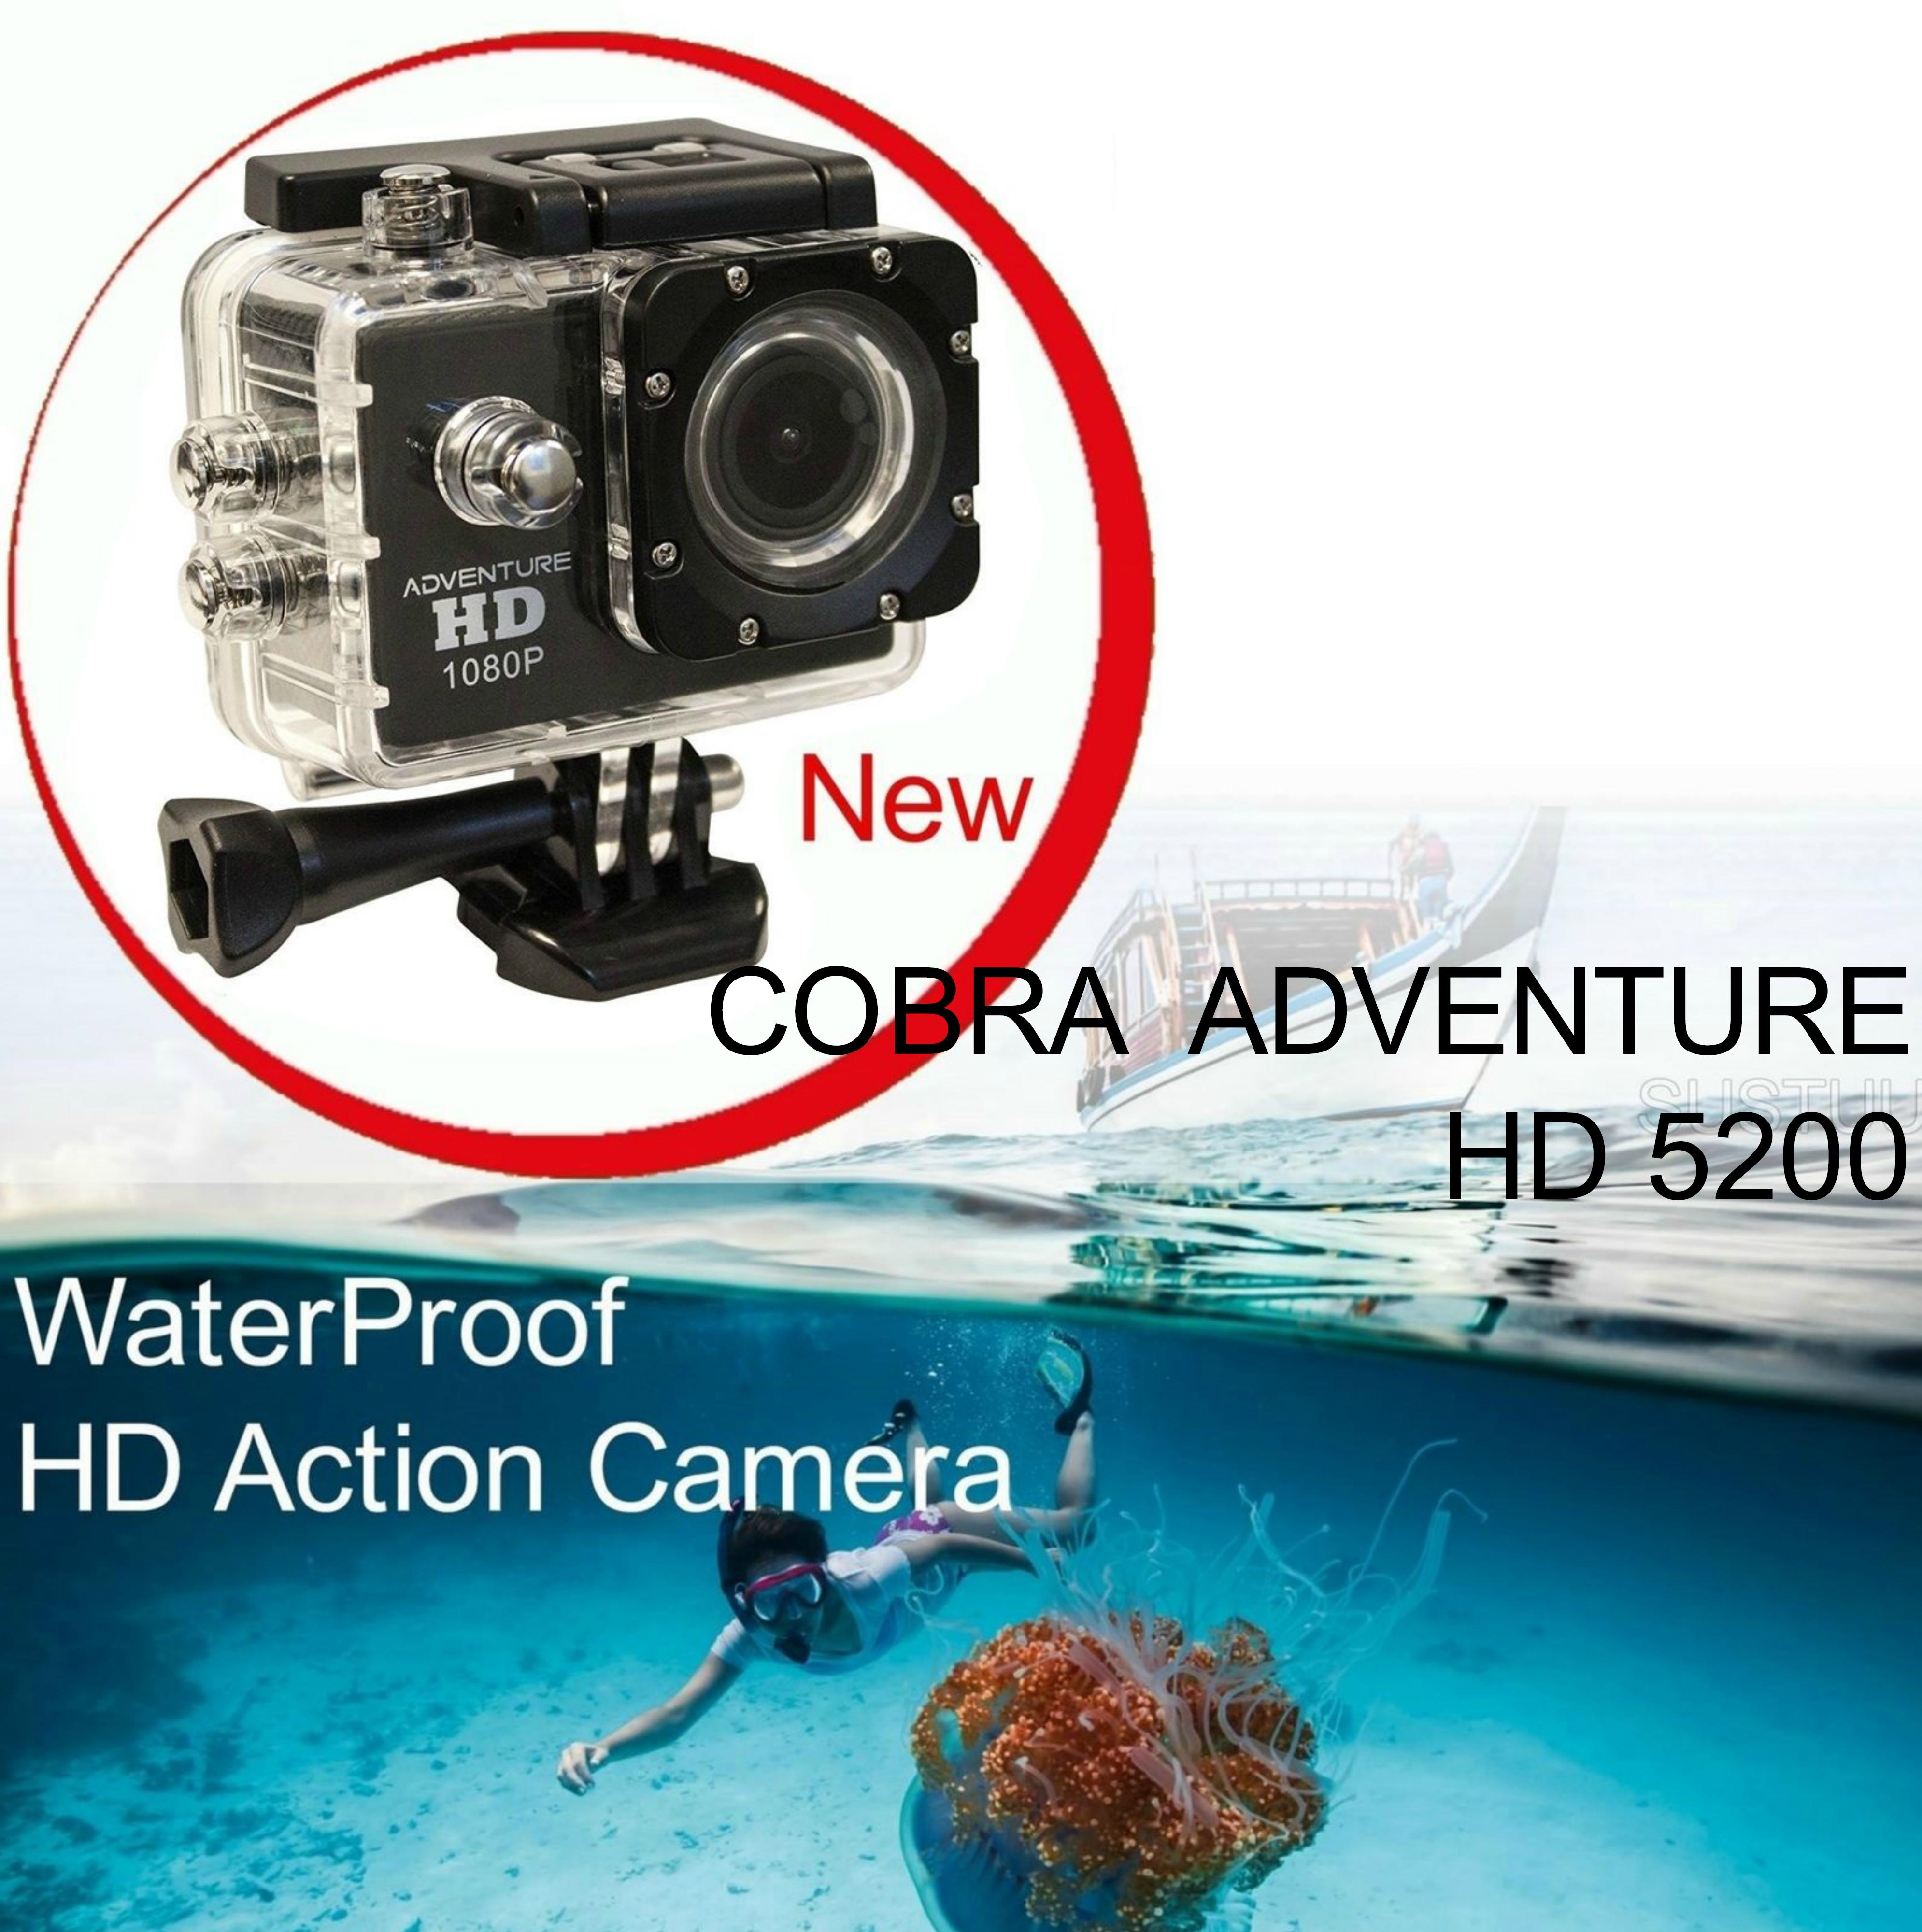 Cobra Adventure HD 5200|Action Camera 1080p|Waterproof <30Mtr|Underwater-Other Sports Recording